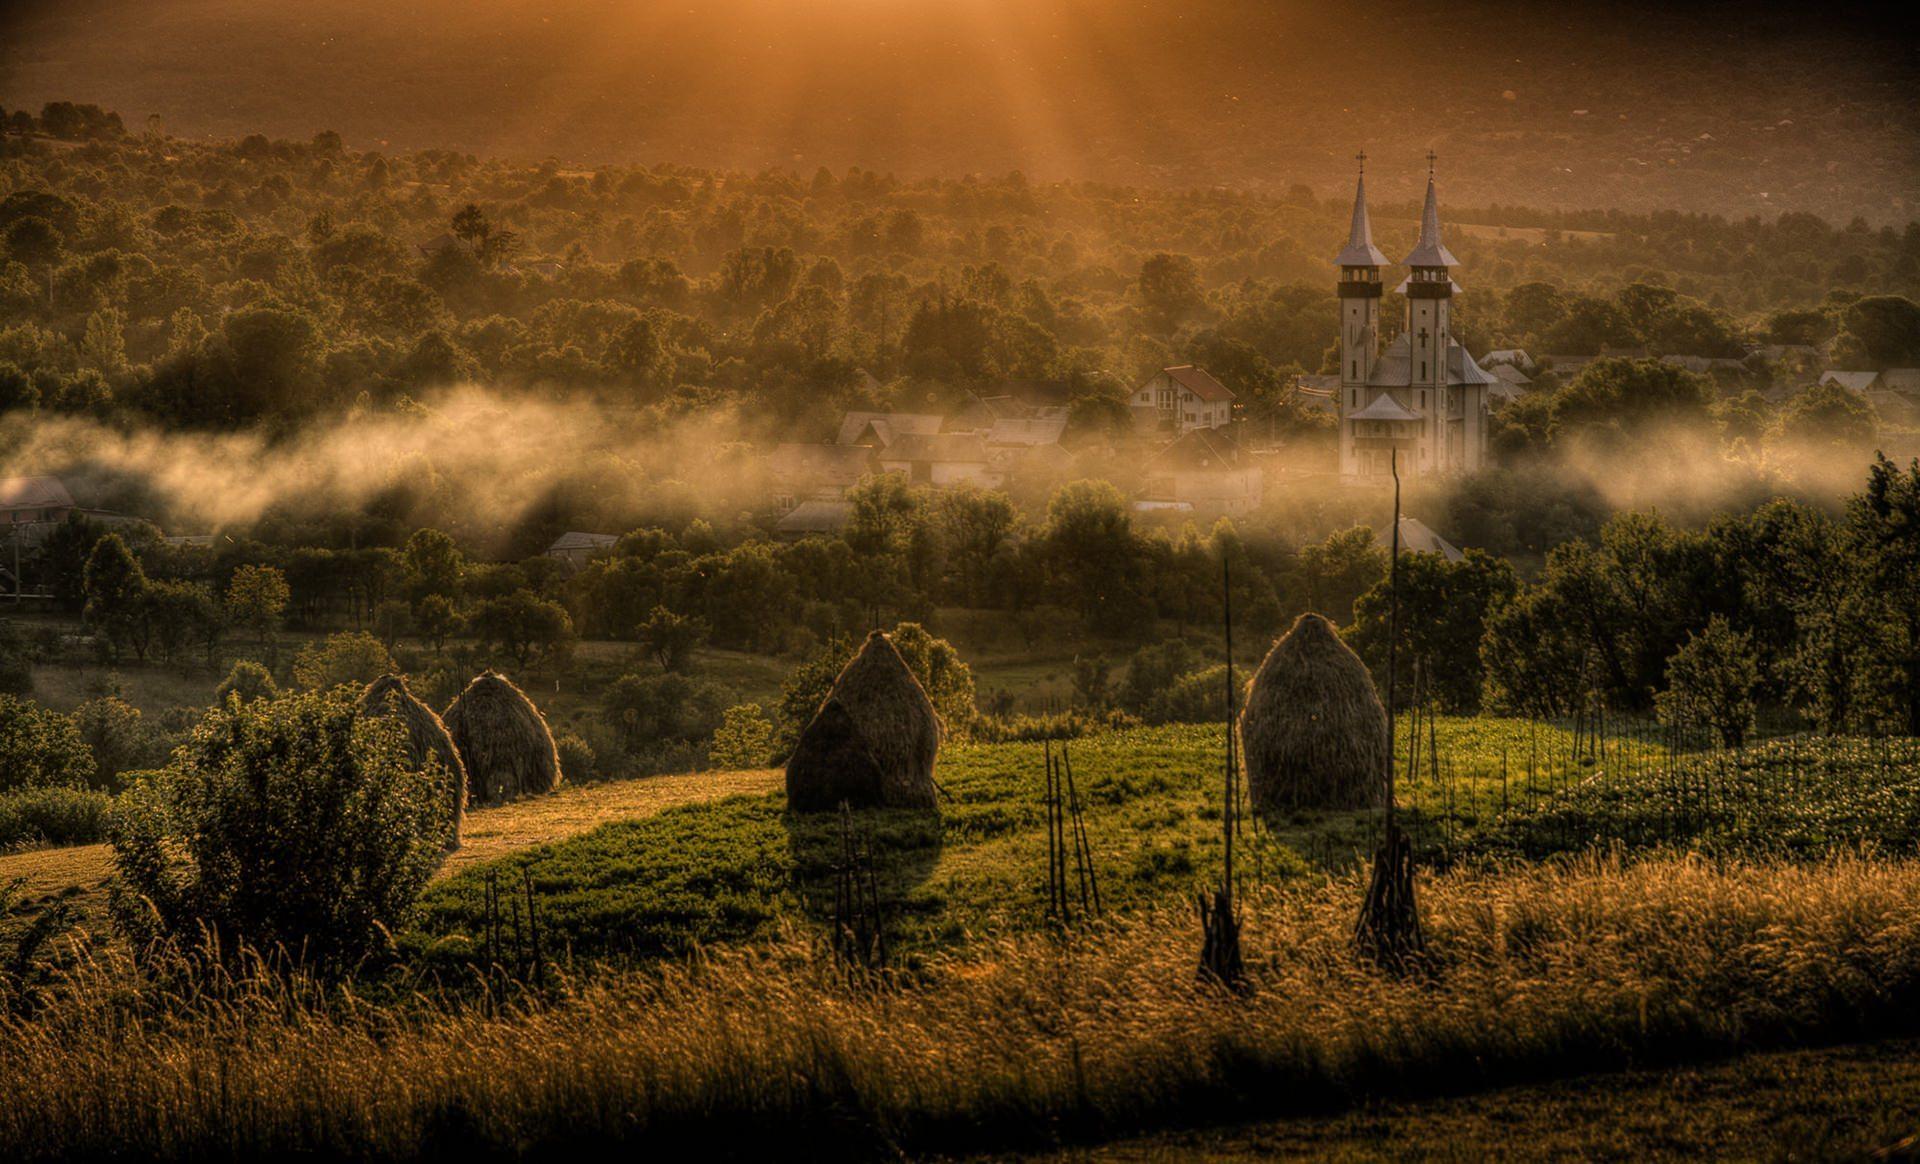 sunset over Breb Maramures County Romania © Hamish Scott-Brown